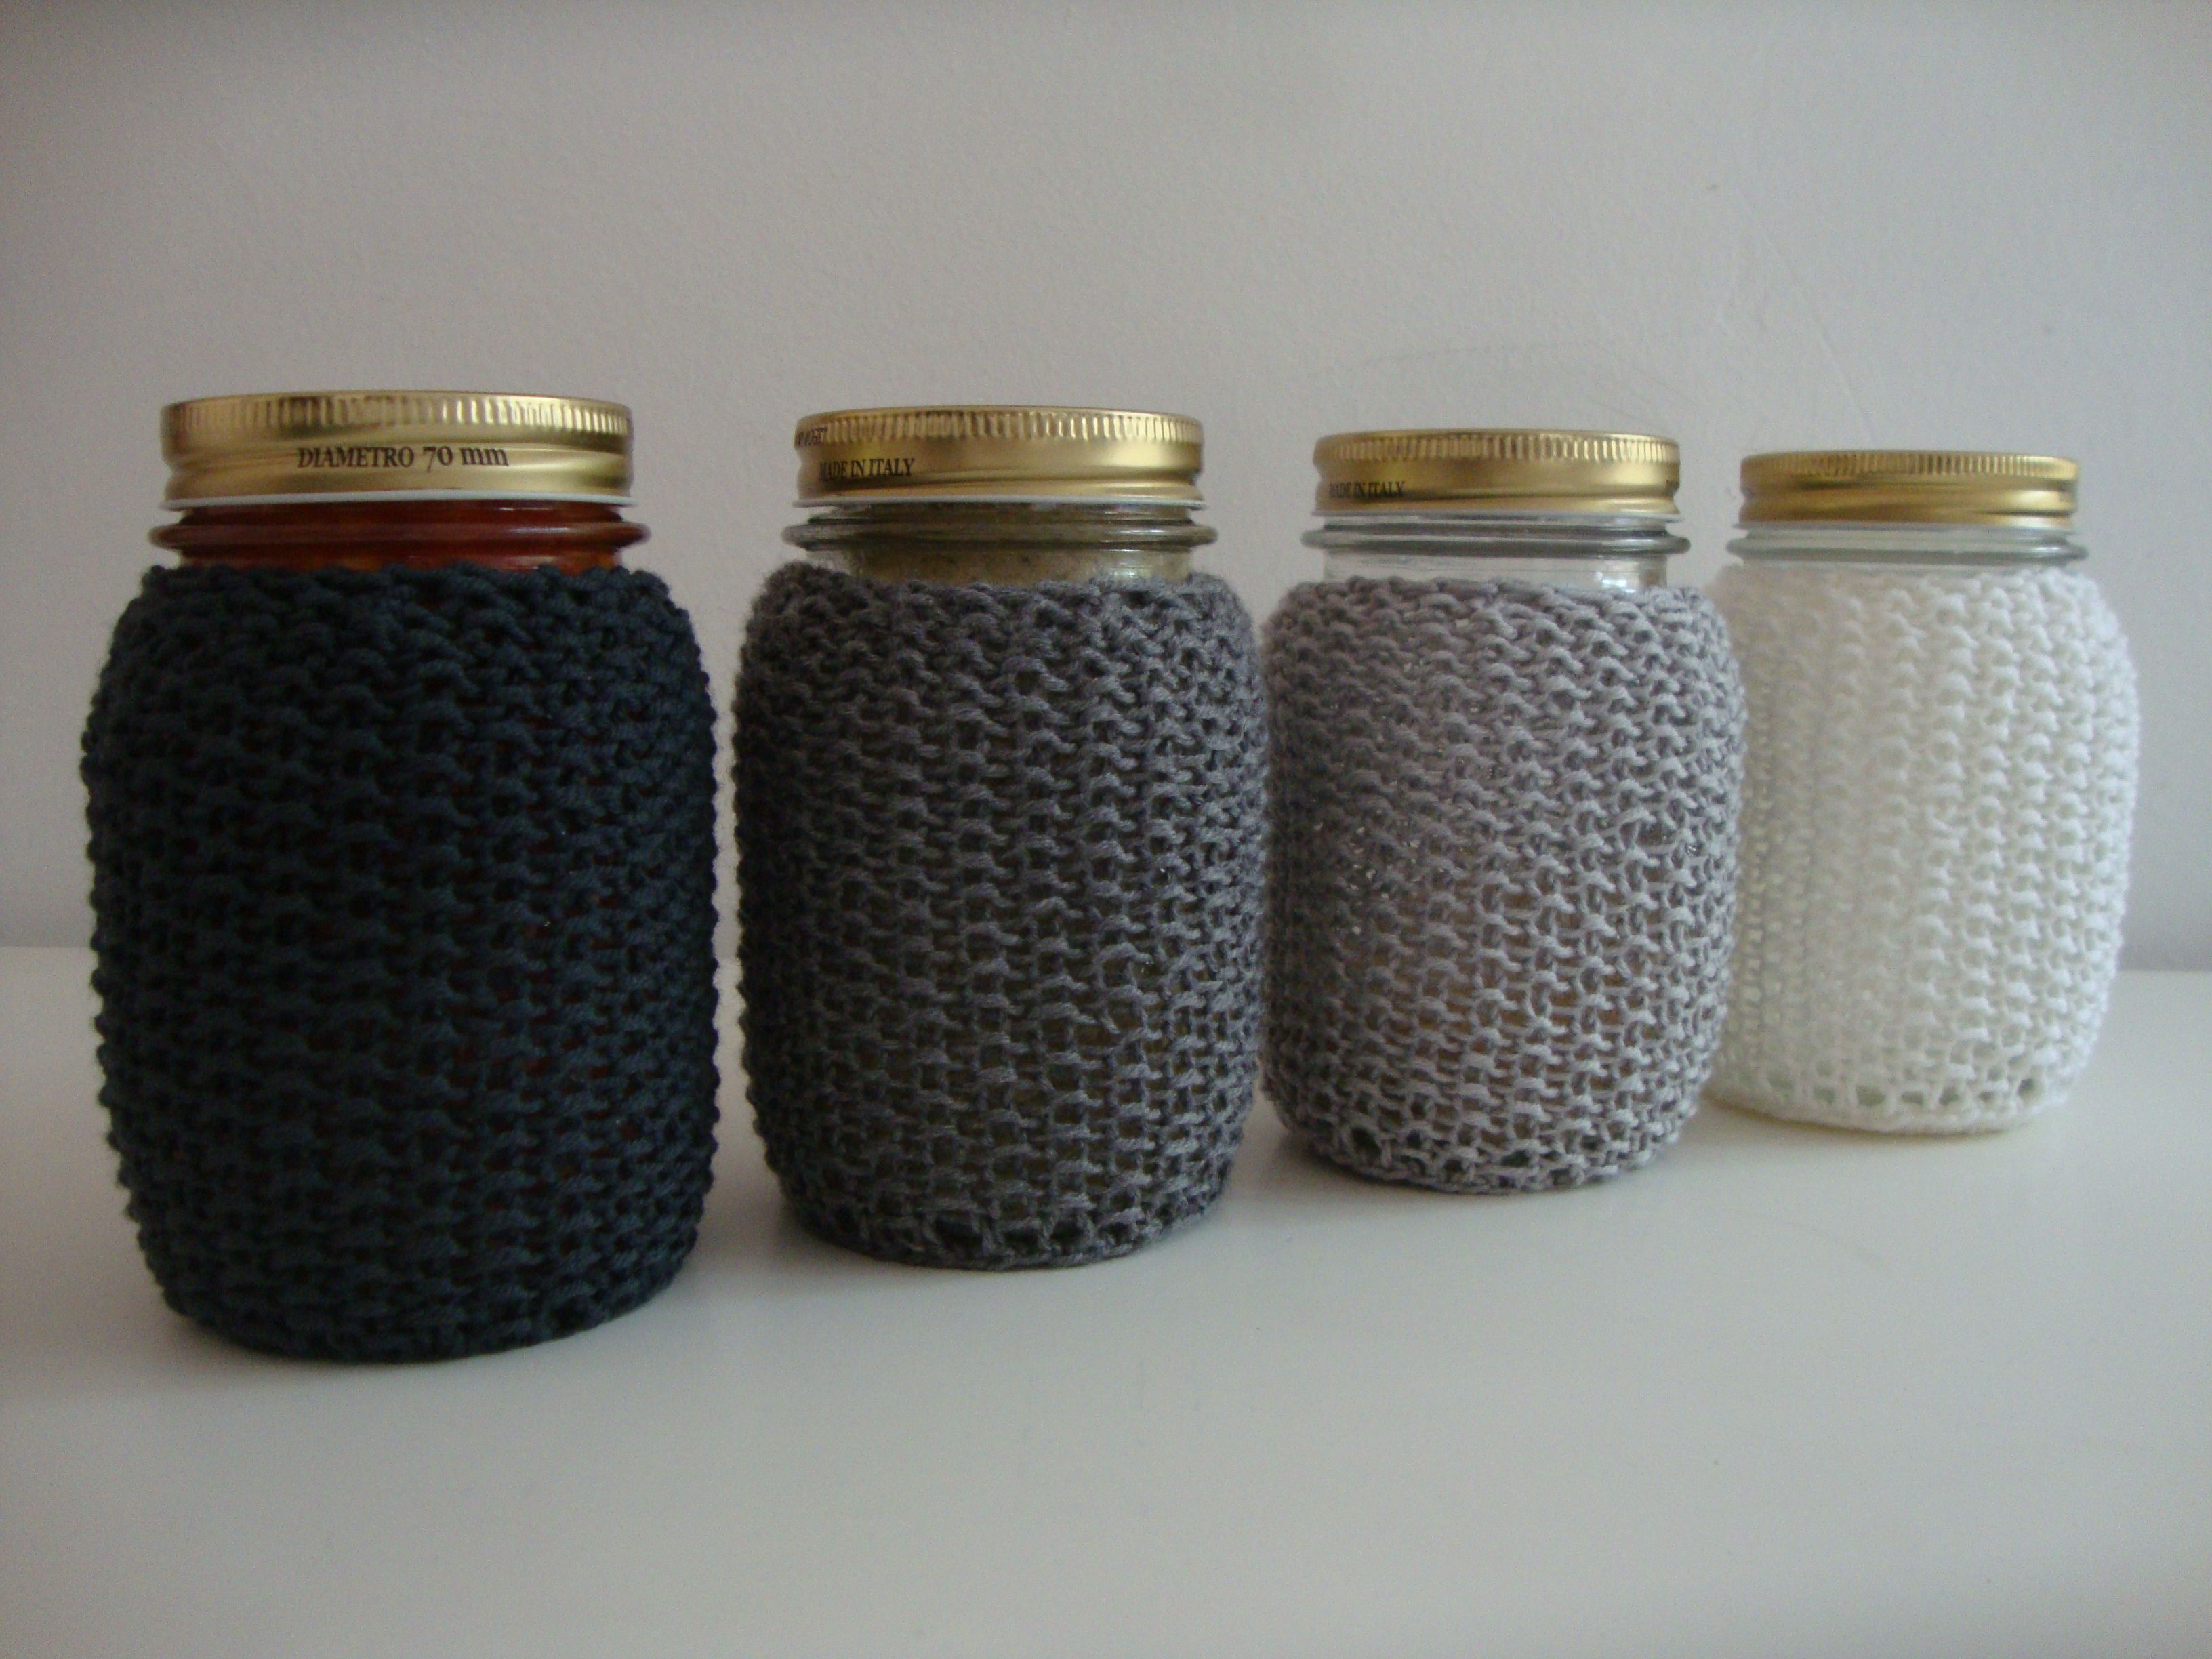 Mason Jar Cozies from Sugar For Your Lemons blog http://sugarforyourlemons.wordpress.com/2011/04/01/mason-jar-cozies/